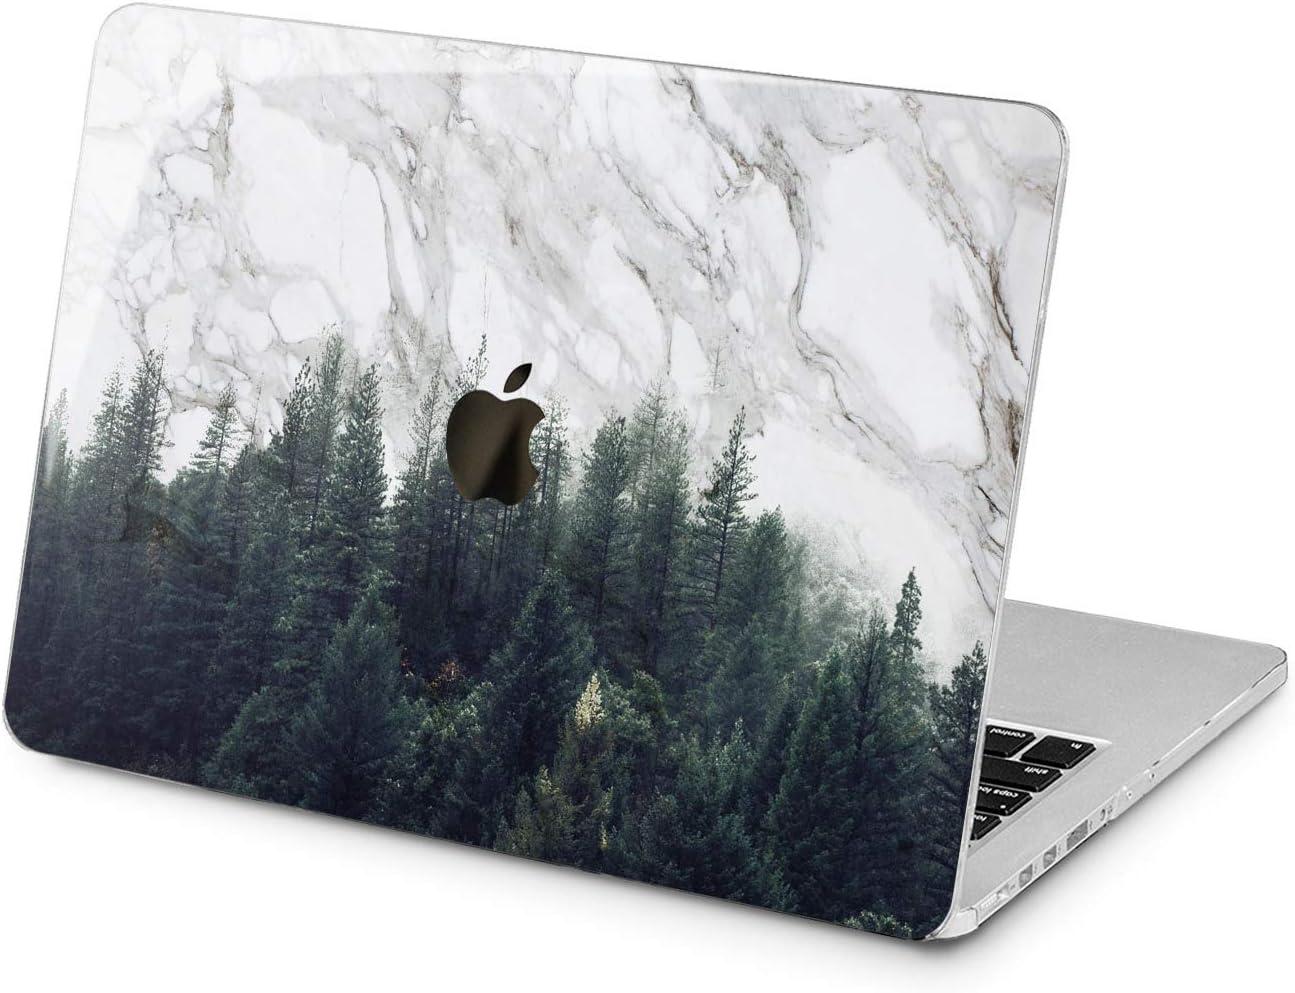 Cavka Hard Shell Case for Apple MacBook Pro 13 2019 15 2018 Air 13 2020 Retina 2015 Mac 11 Mac 12 Nature Print Trees Decor Design Geometric Wood Forest Unique Laptop Protective Plastic Cover